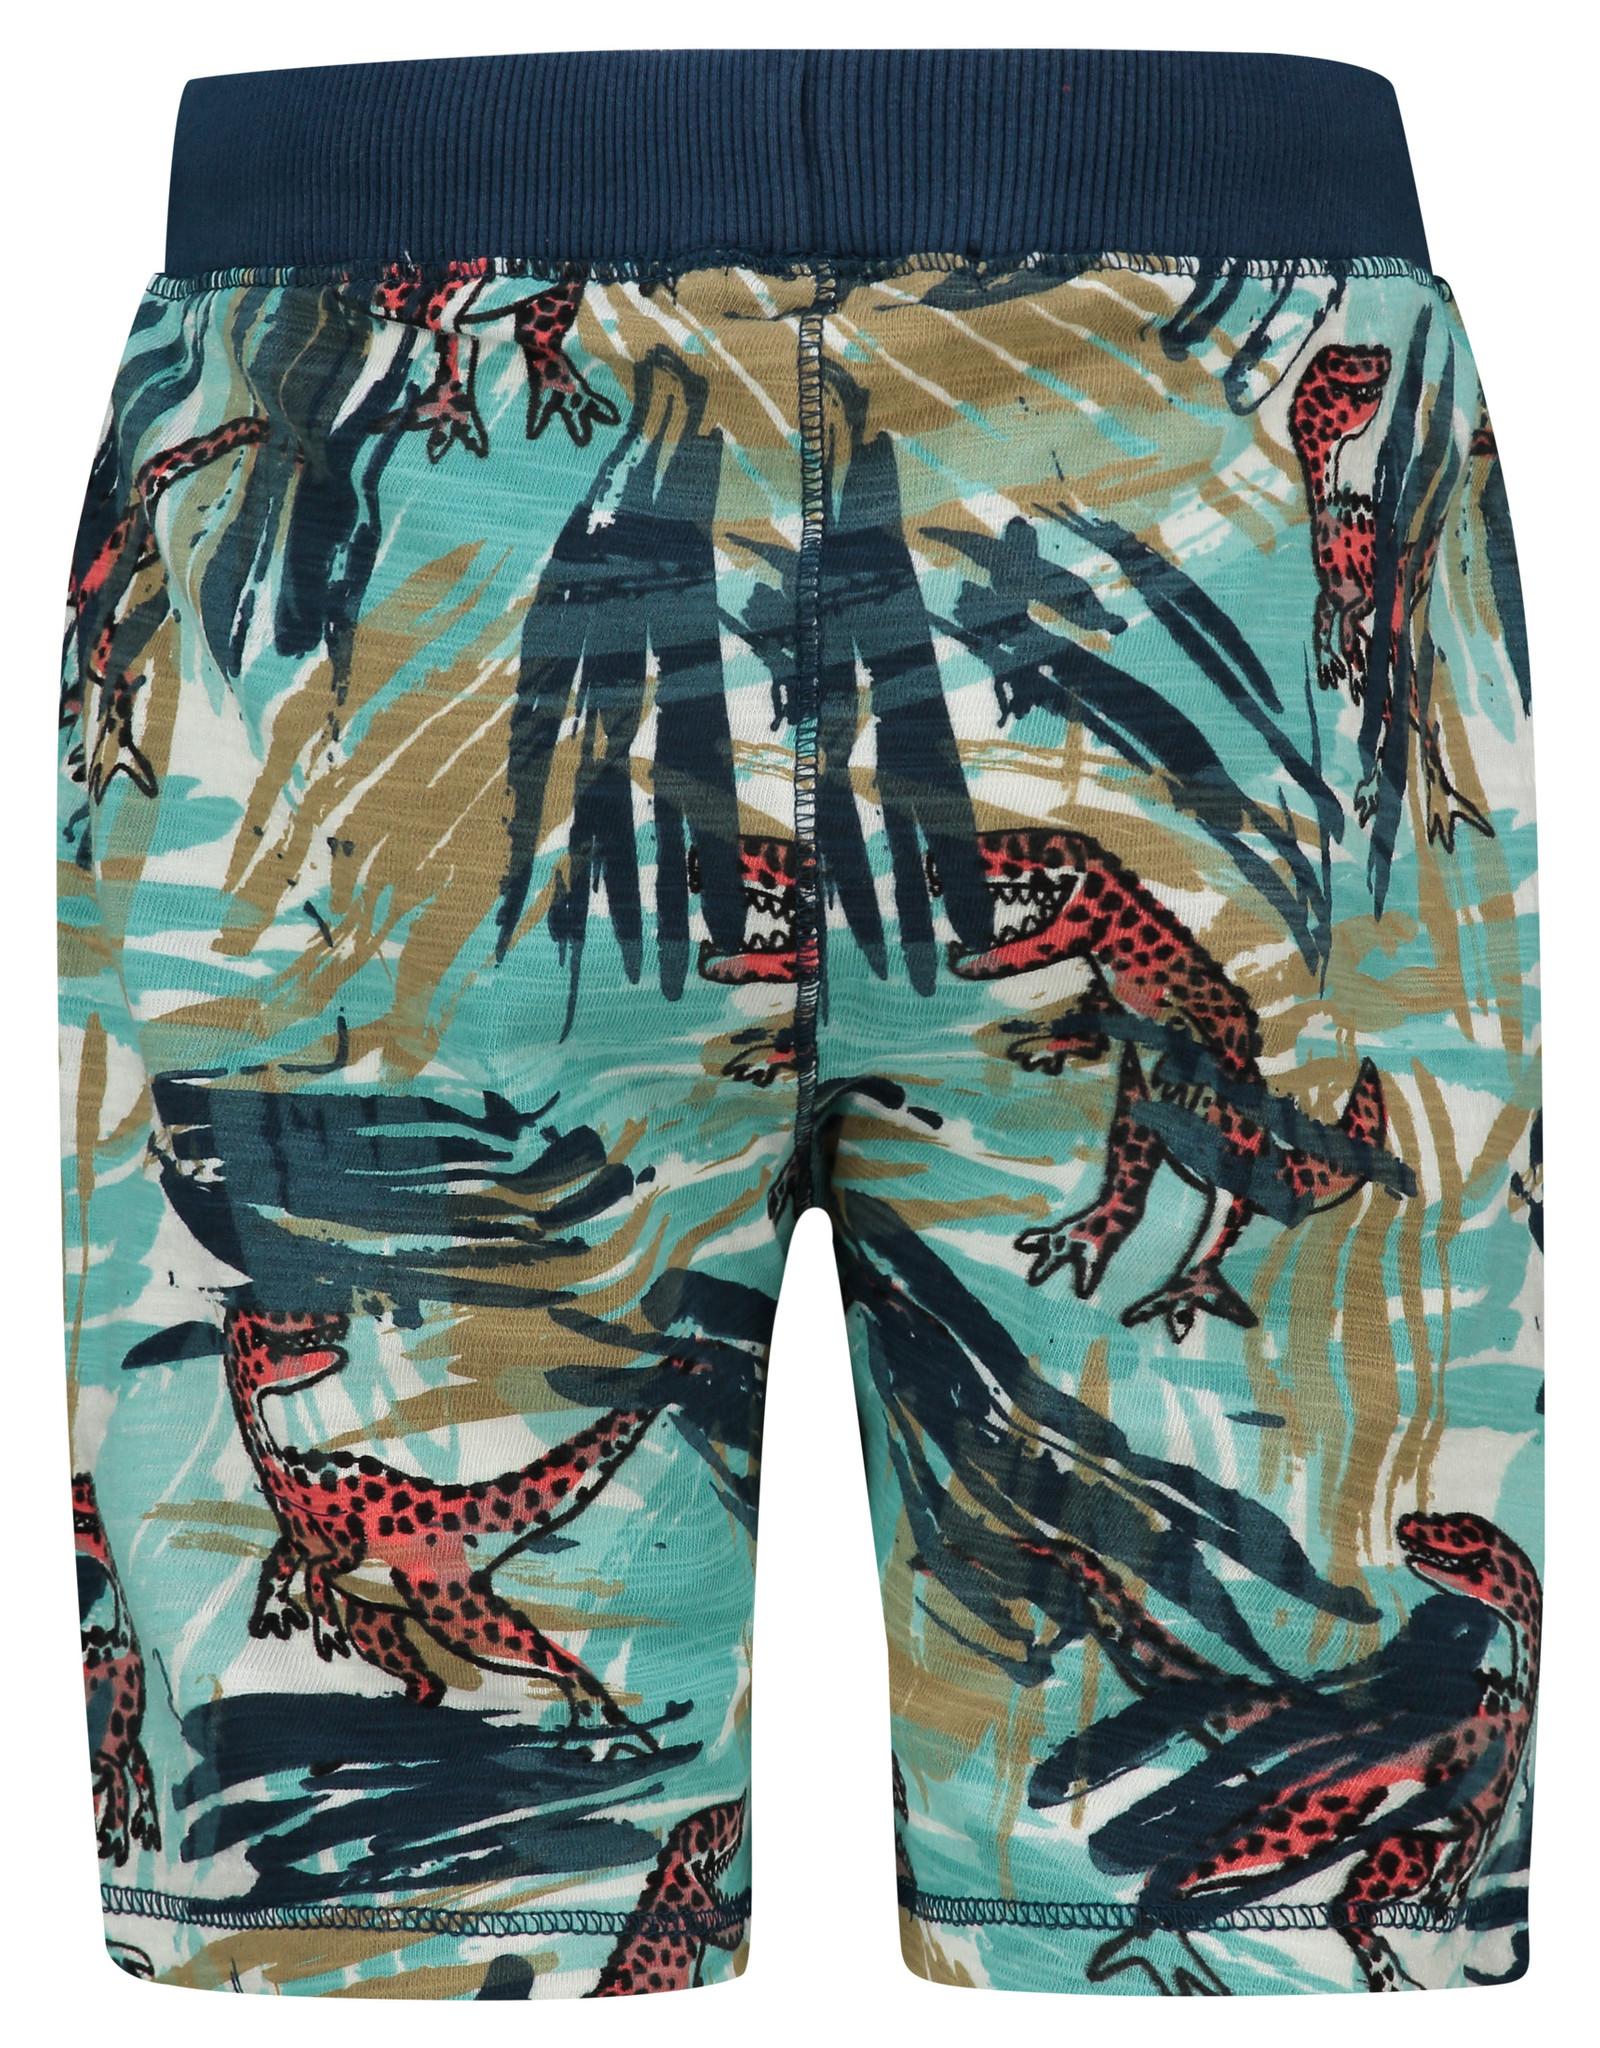 Noppies B Short Knit Jeannot aop, Lagoon